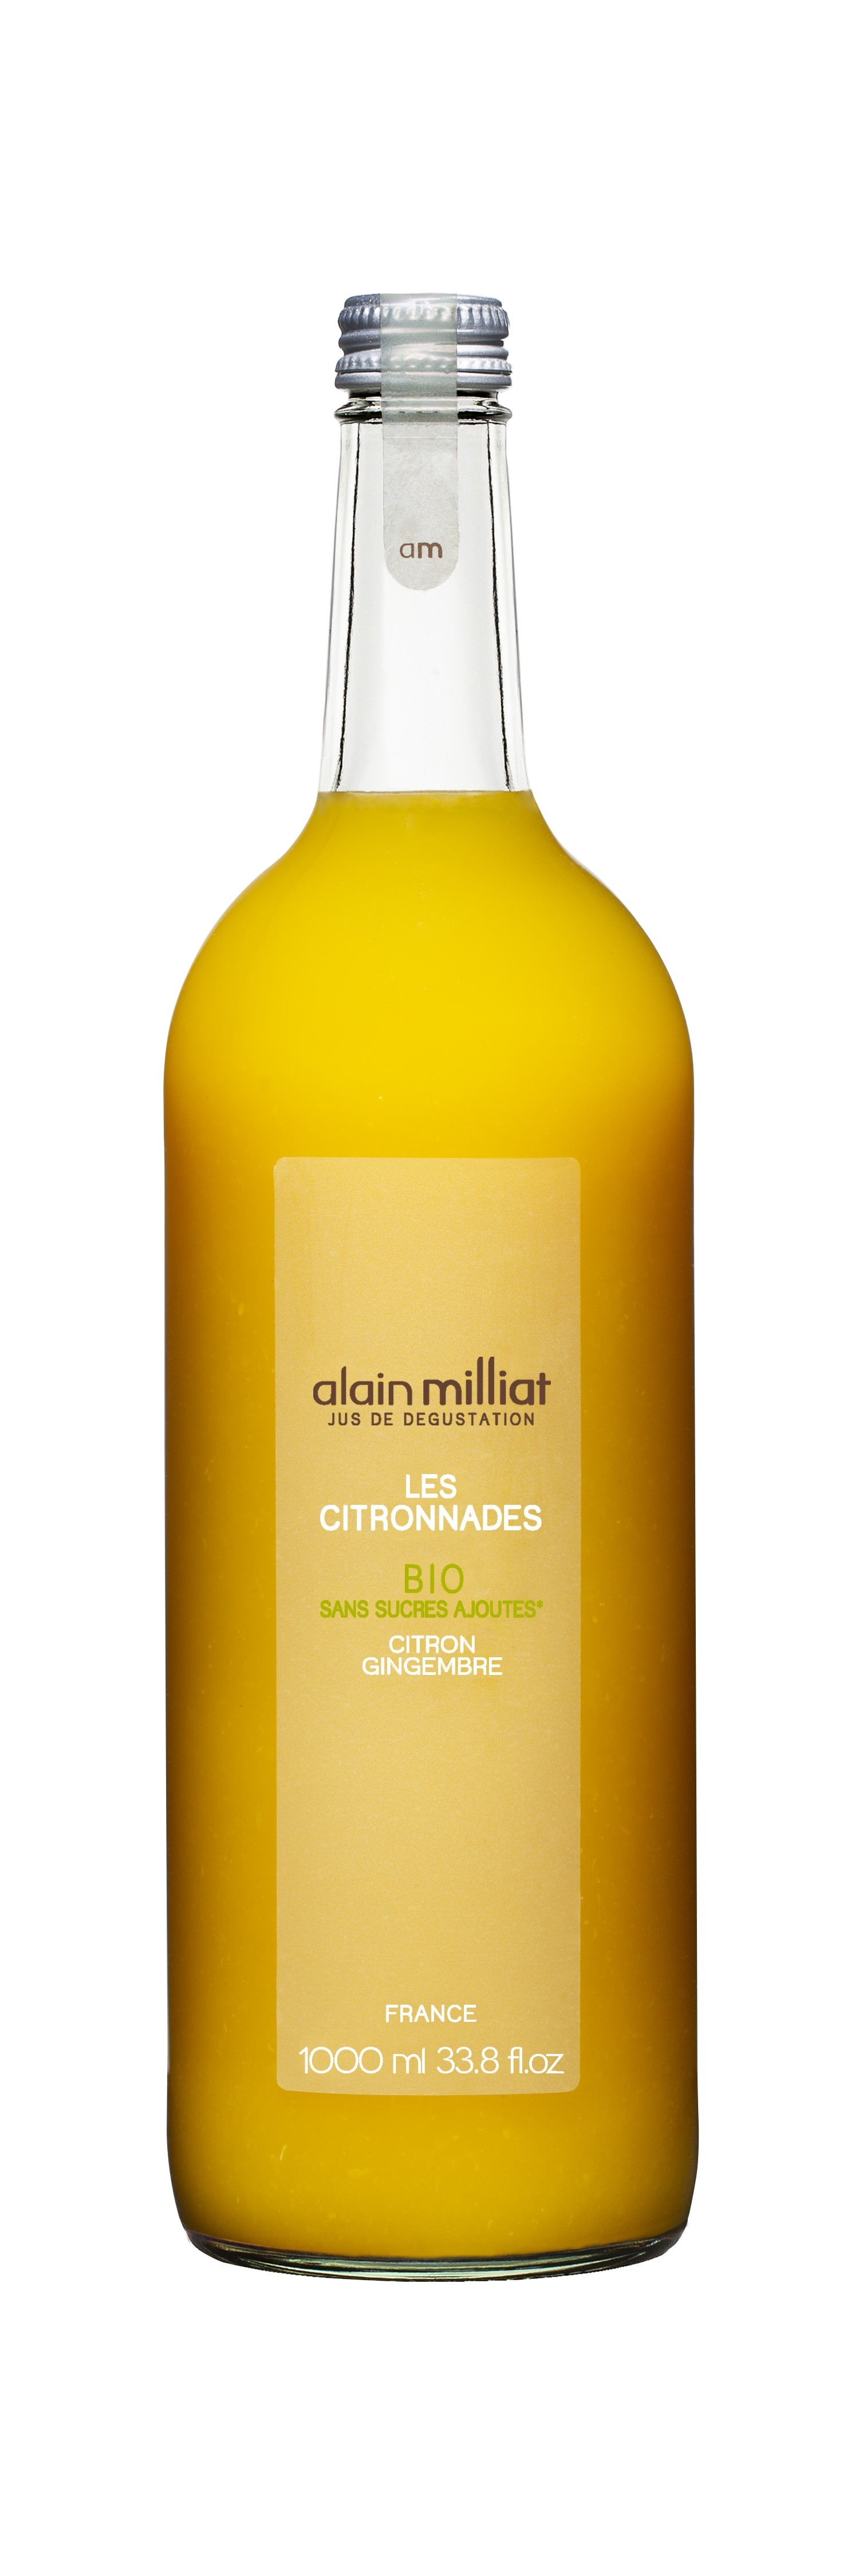 Citronnade Citron - Gingembre BIO, Alain Milliat (1 L)